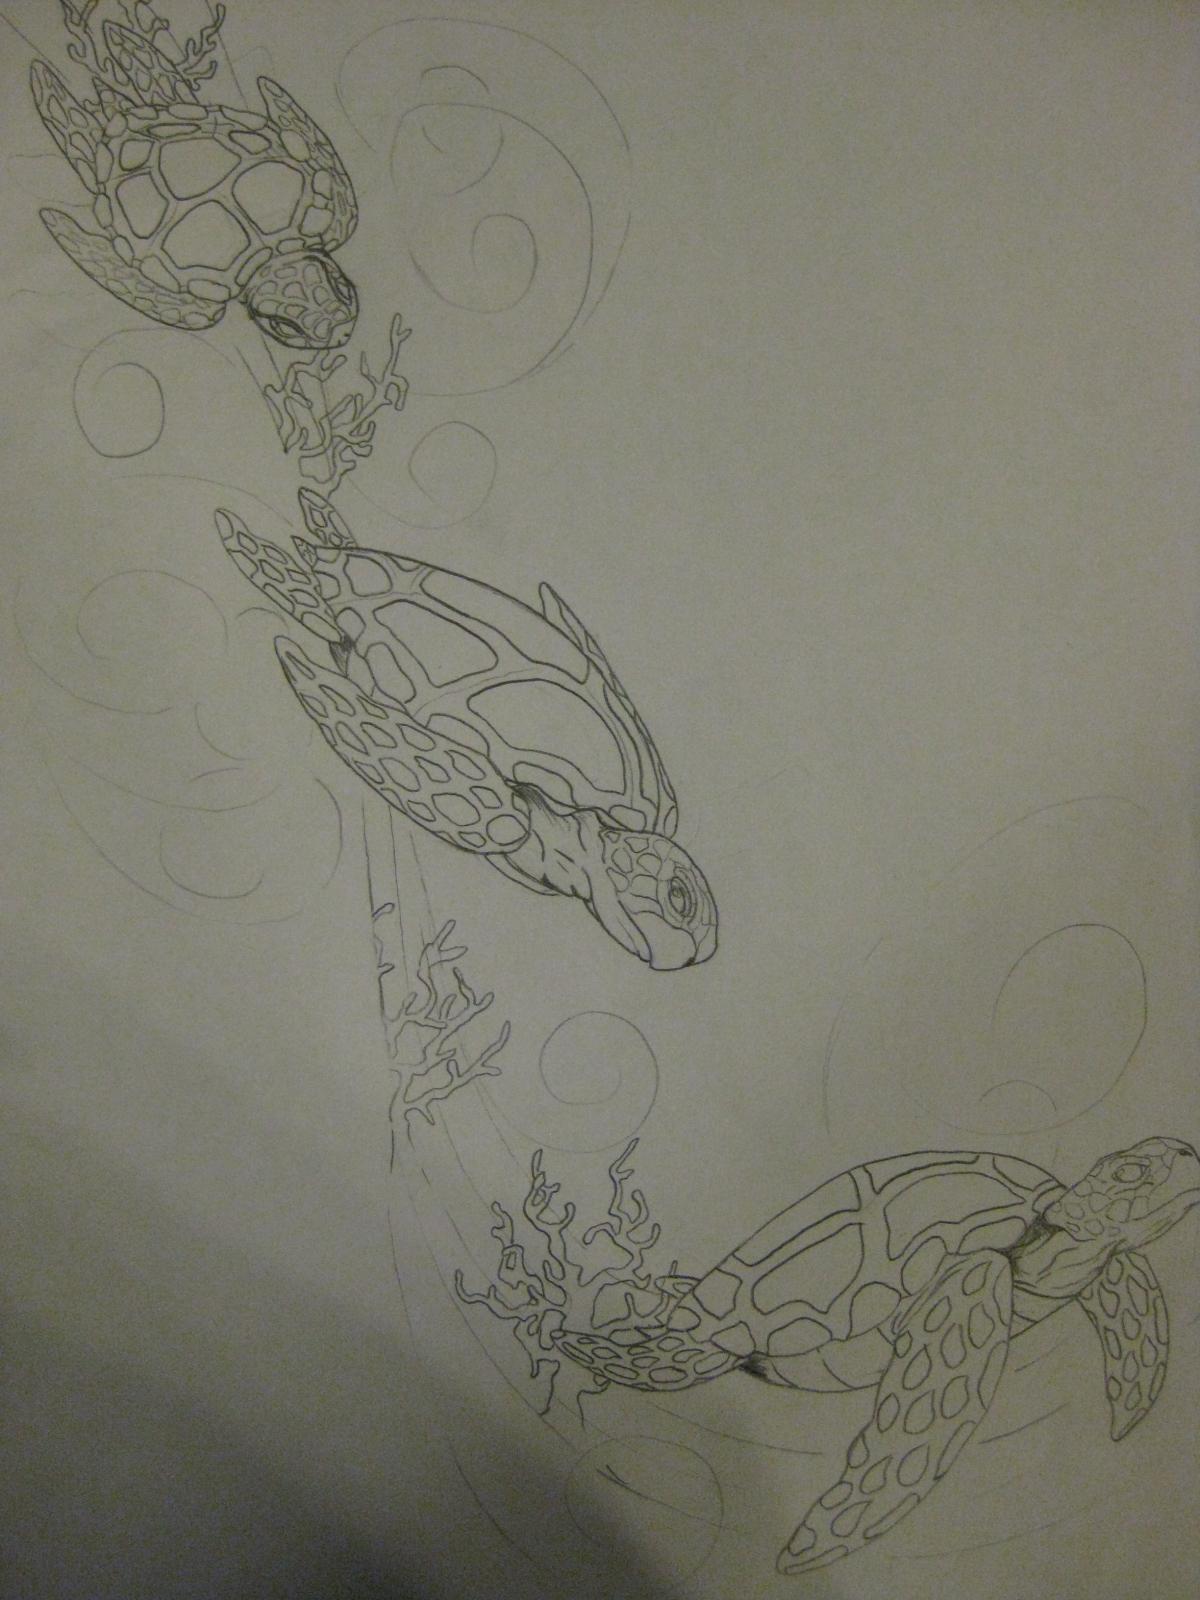 ... modification tattoos 2010 2014 iz4nidomp4in a turtle tattoo design